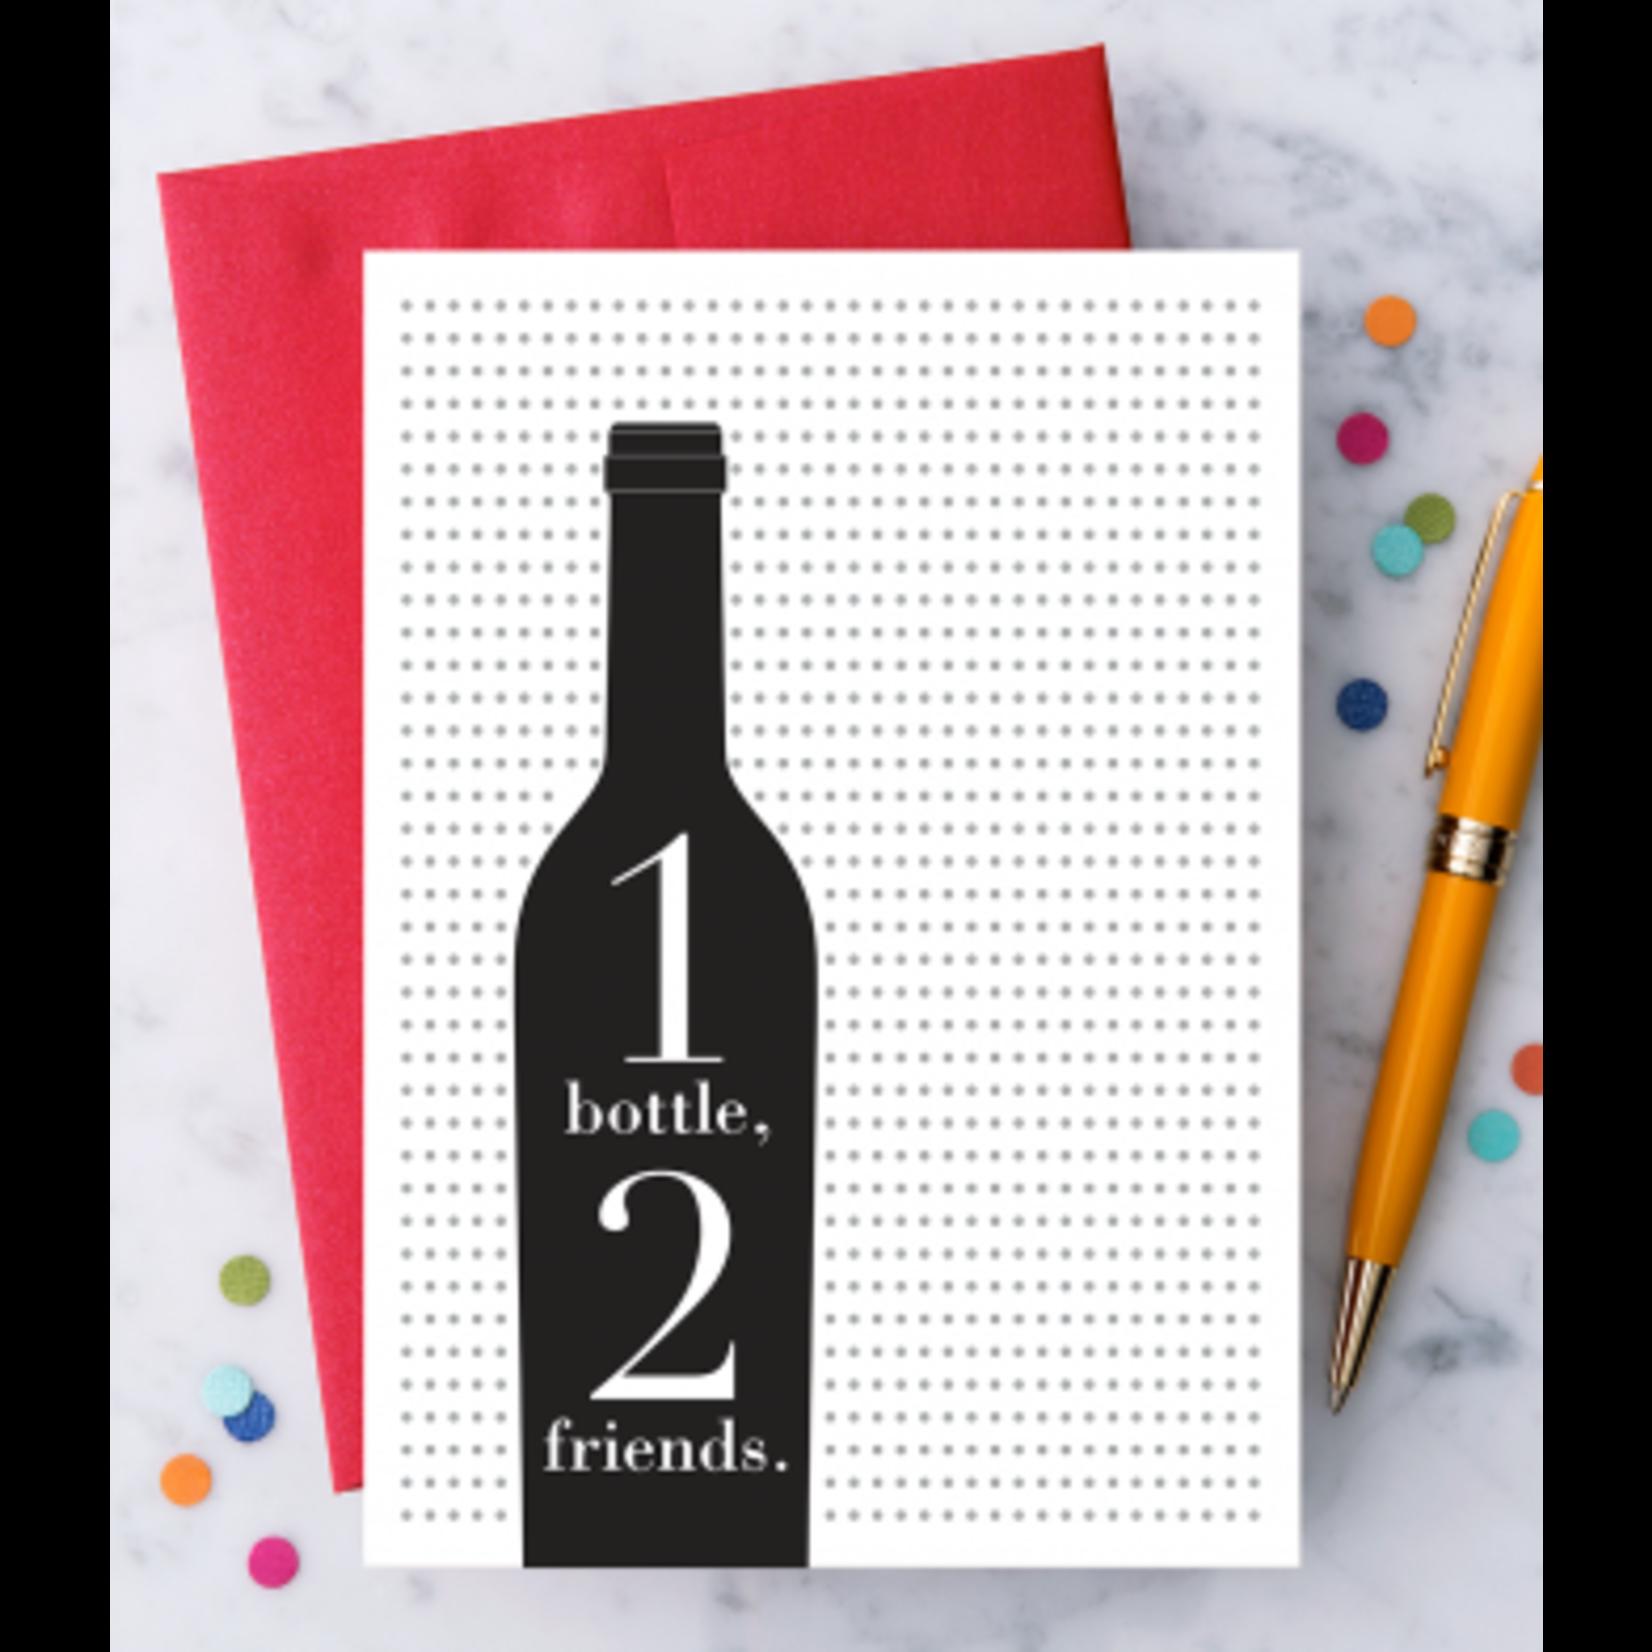 Design With Heart 1 Bottle, 2 Friends